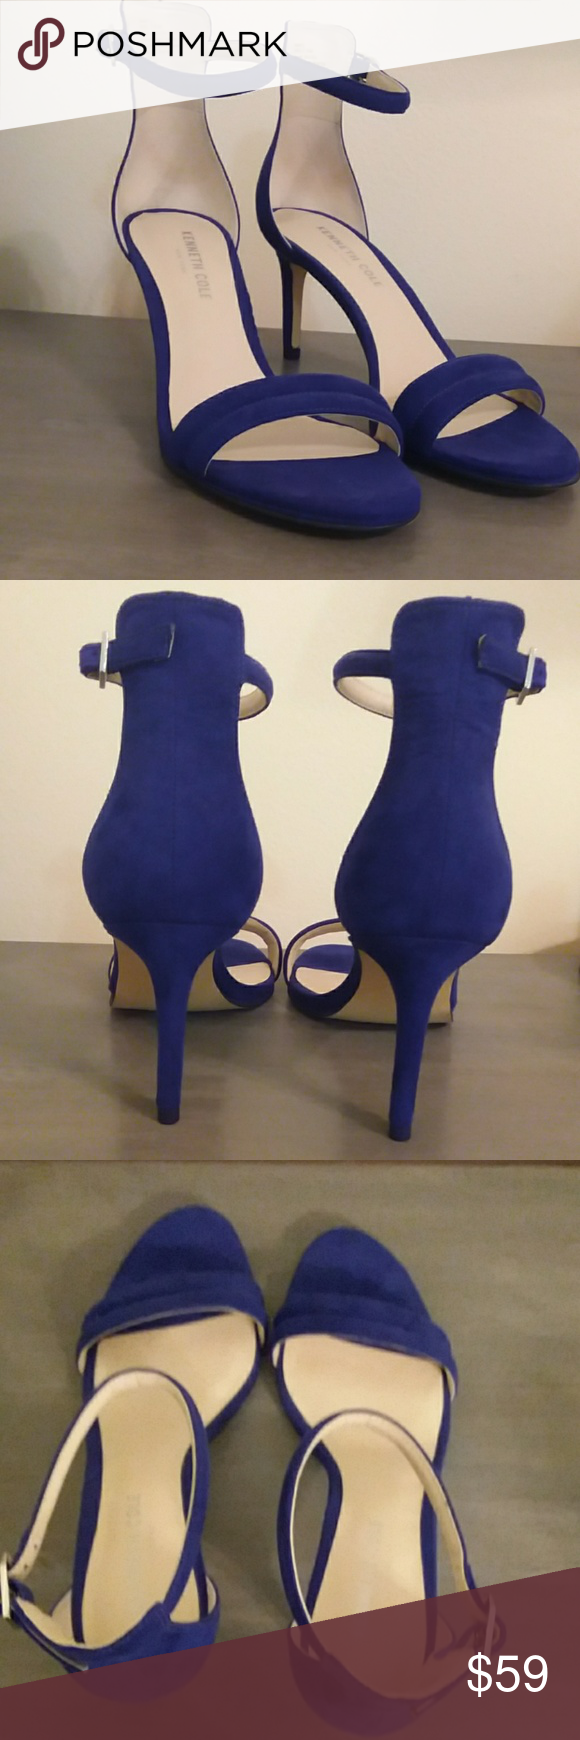 Kenneth Cole Sandals Cobalt blue Kenneth Cole Sandals Kenneth Cole Shoes Sandals